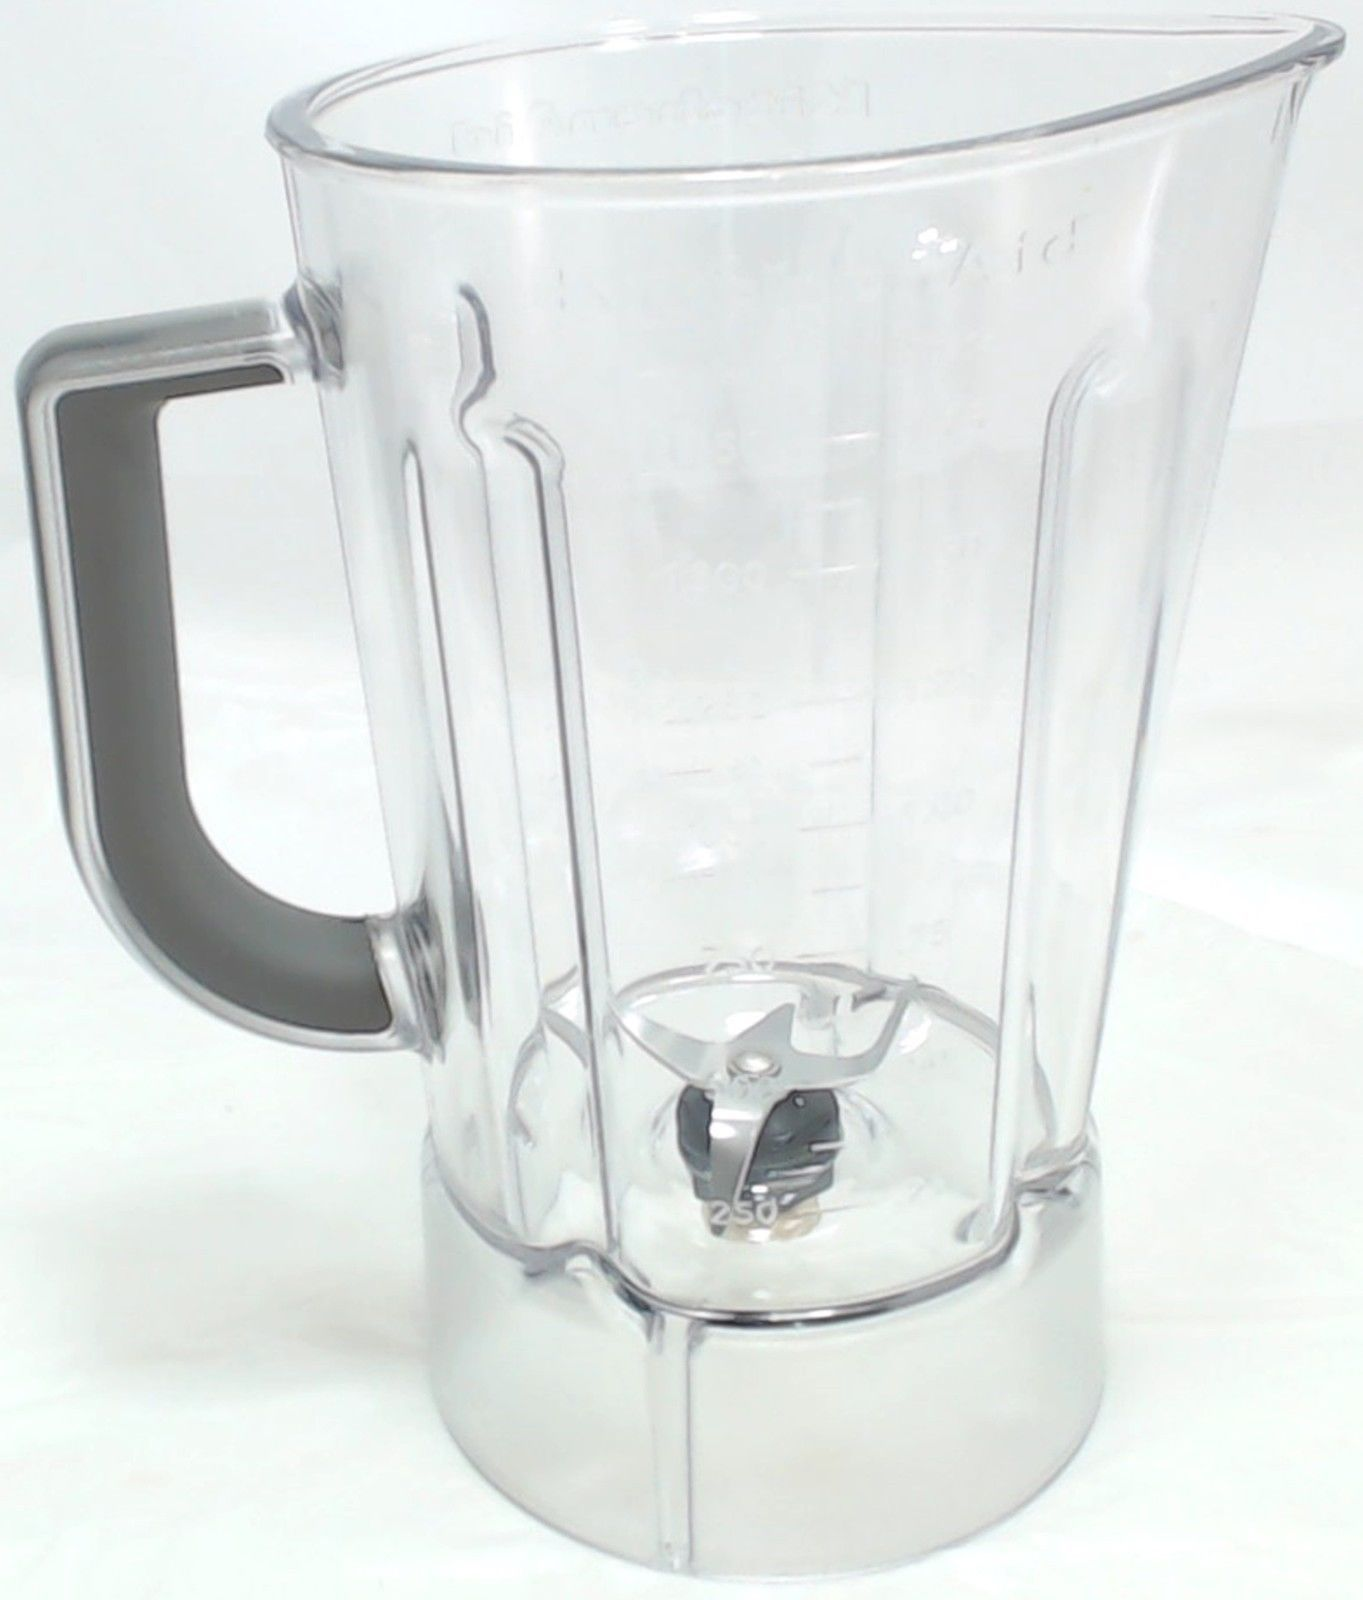 Kitchenaid Plastic Blender Jar Assembly 56 Oz Ap5804640